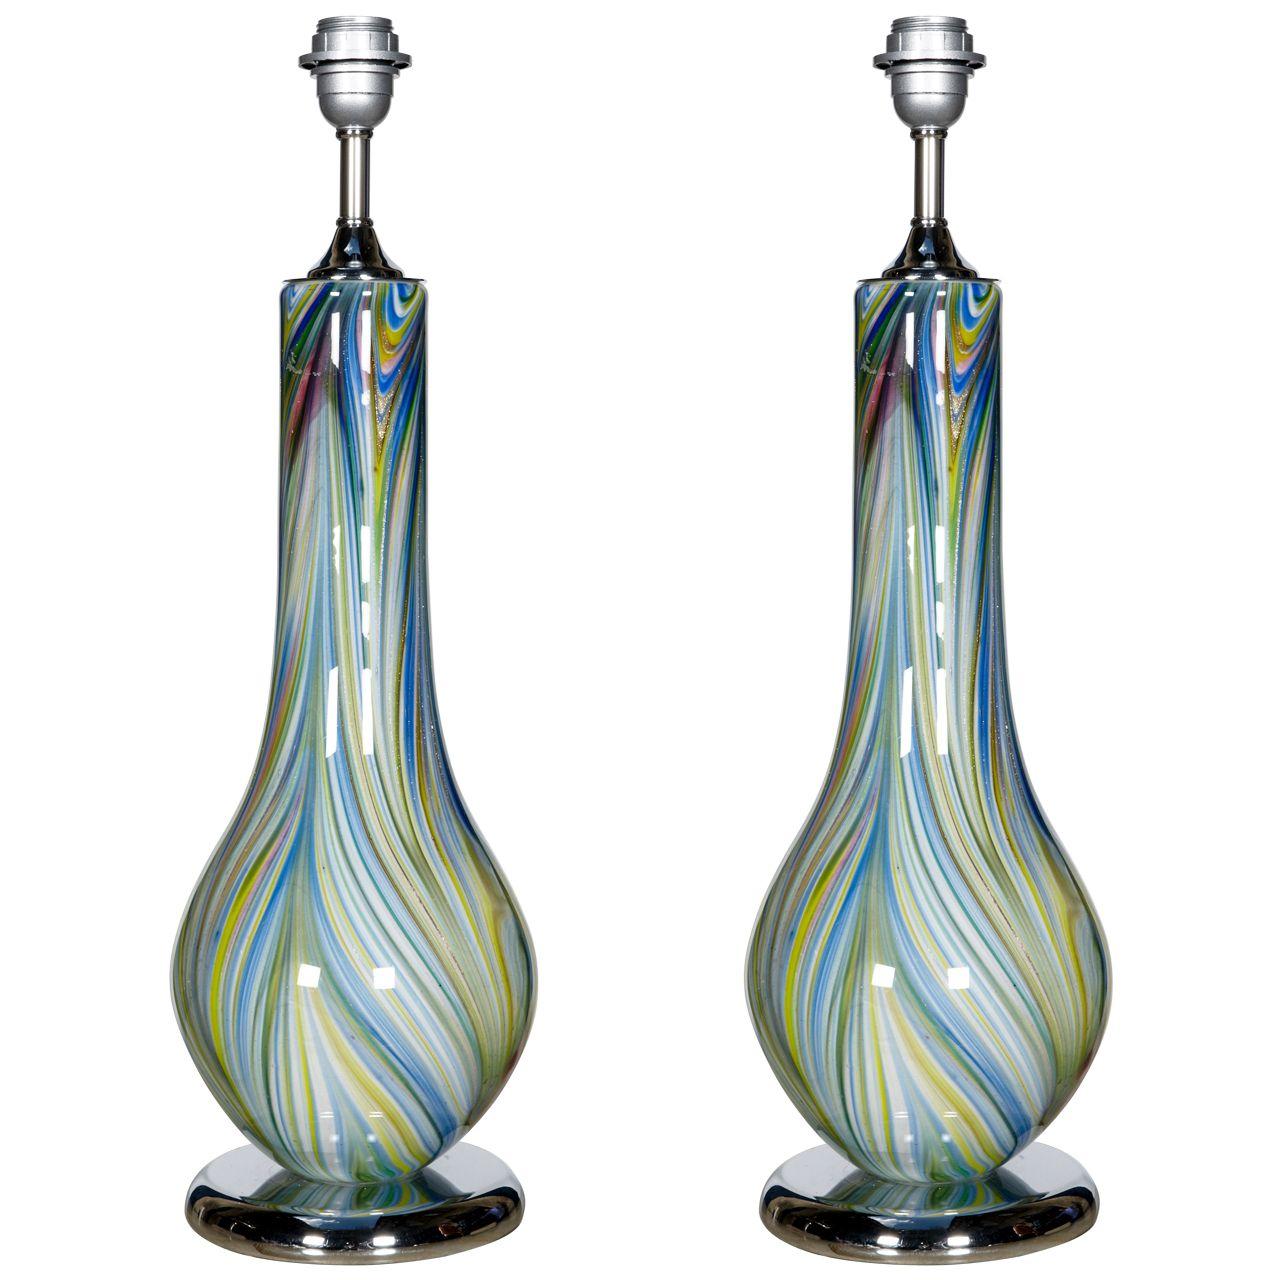 1stdibs.com | Pair Of 1980's Murano Glass Lamps